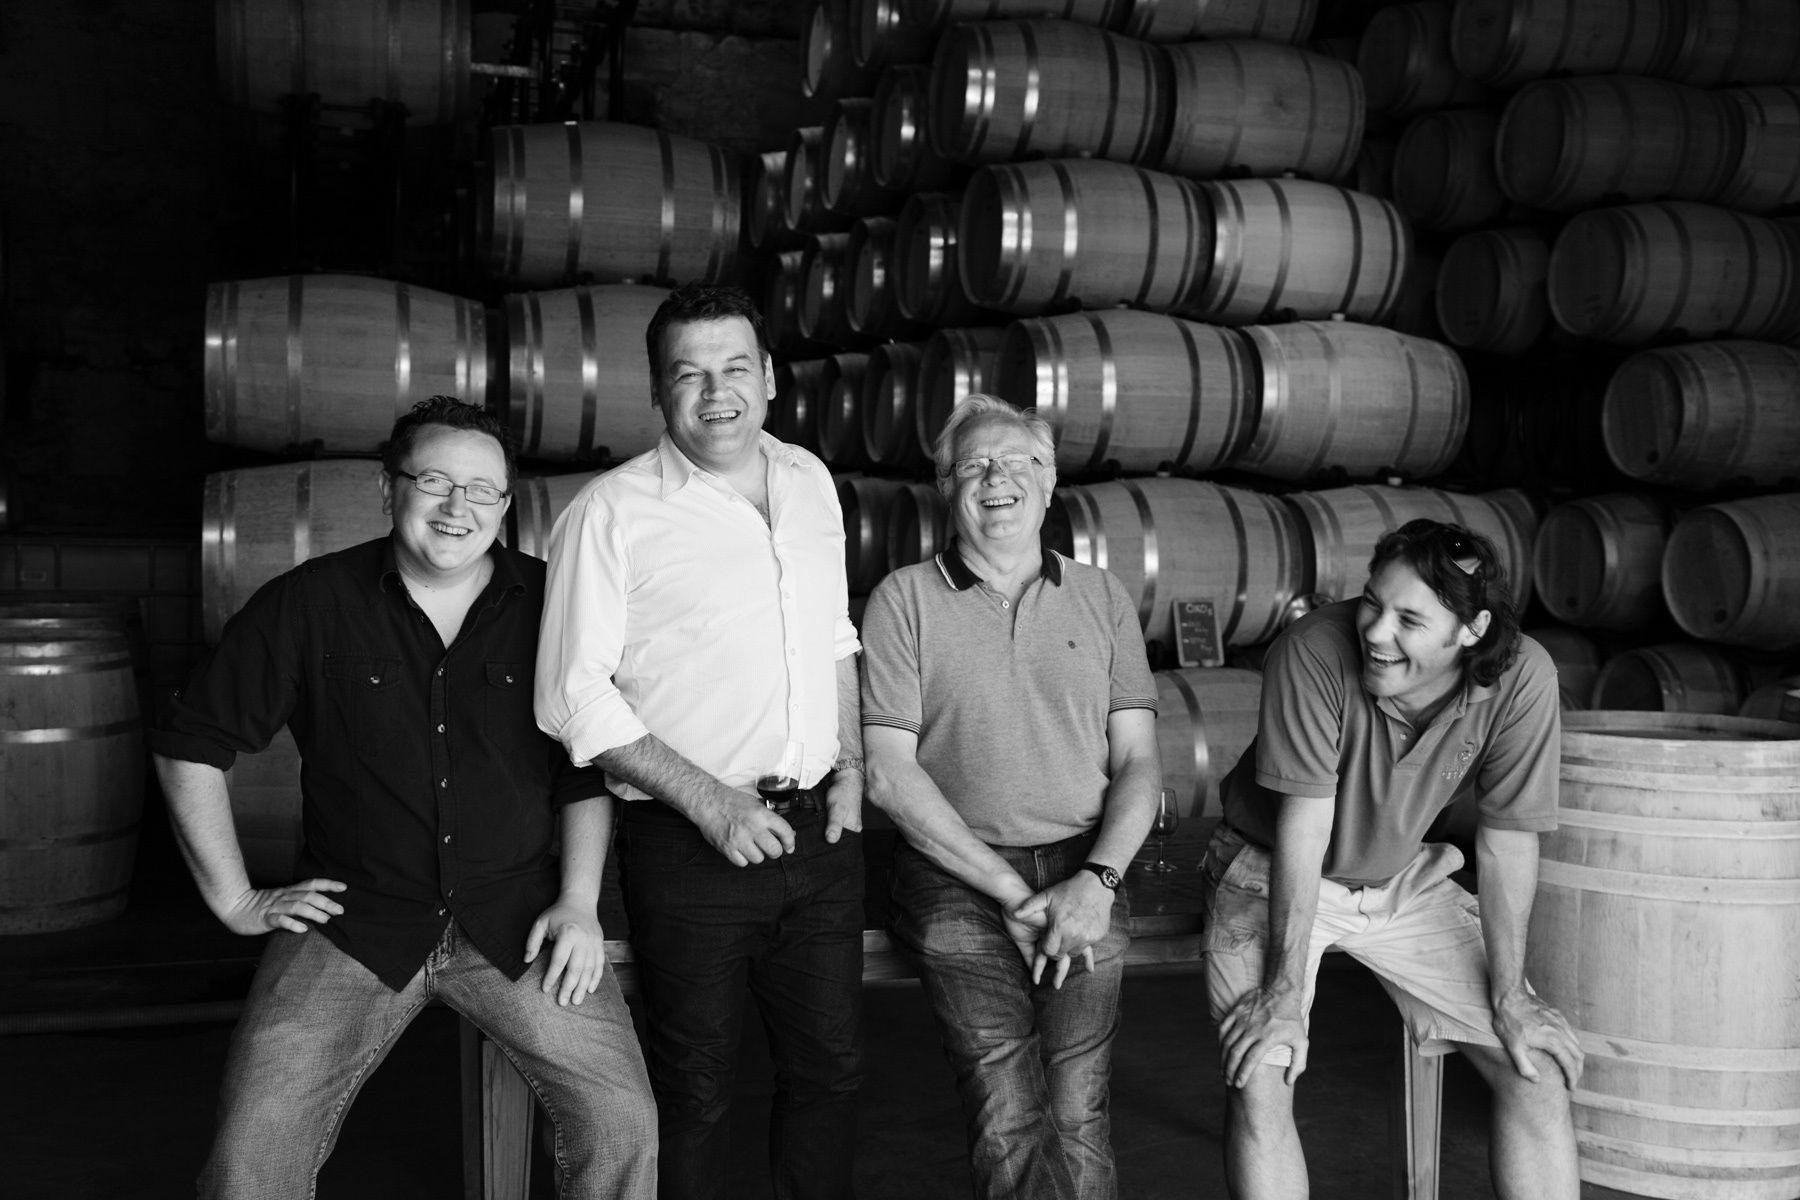 Laithwaites Wine - Le Chai au QuaiTom Laithwaite, Jean Marc Sauboa, Tony Laithwaite, Mark Hoddy